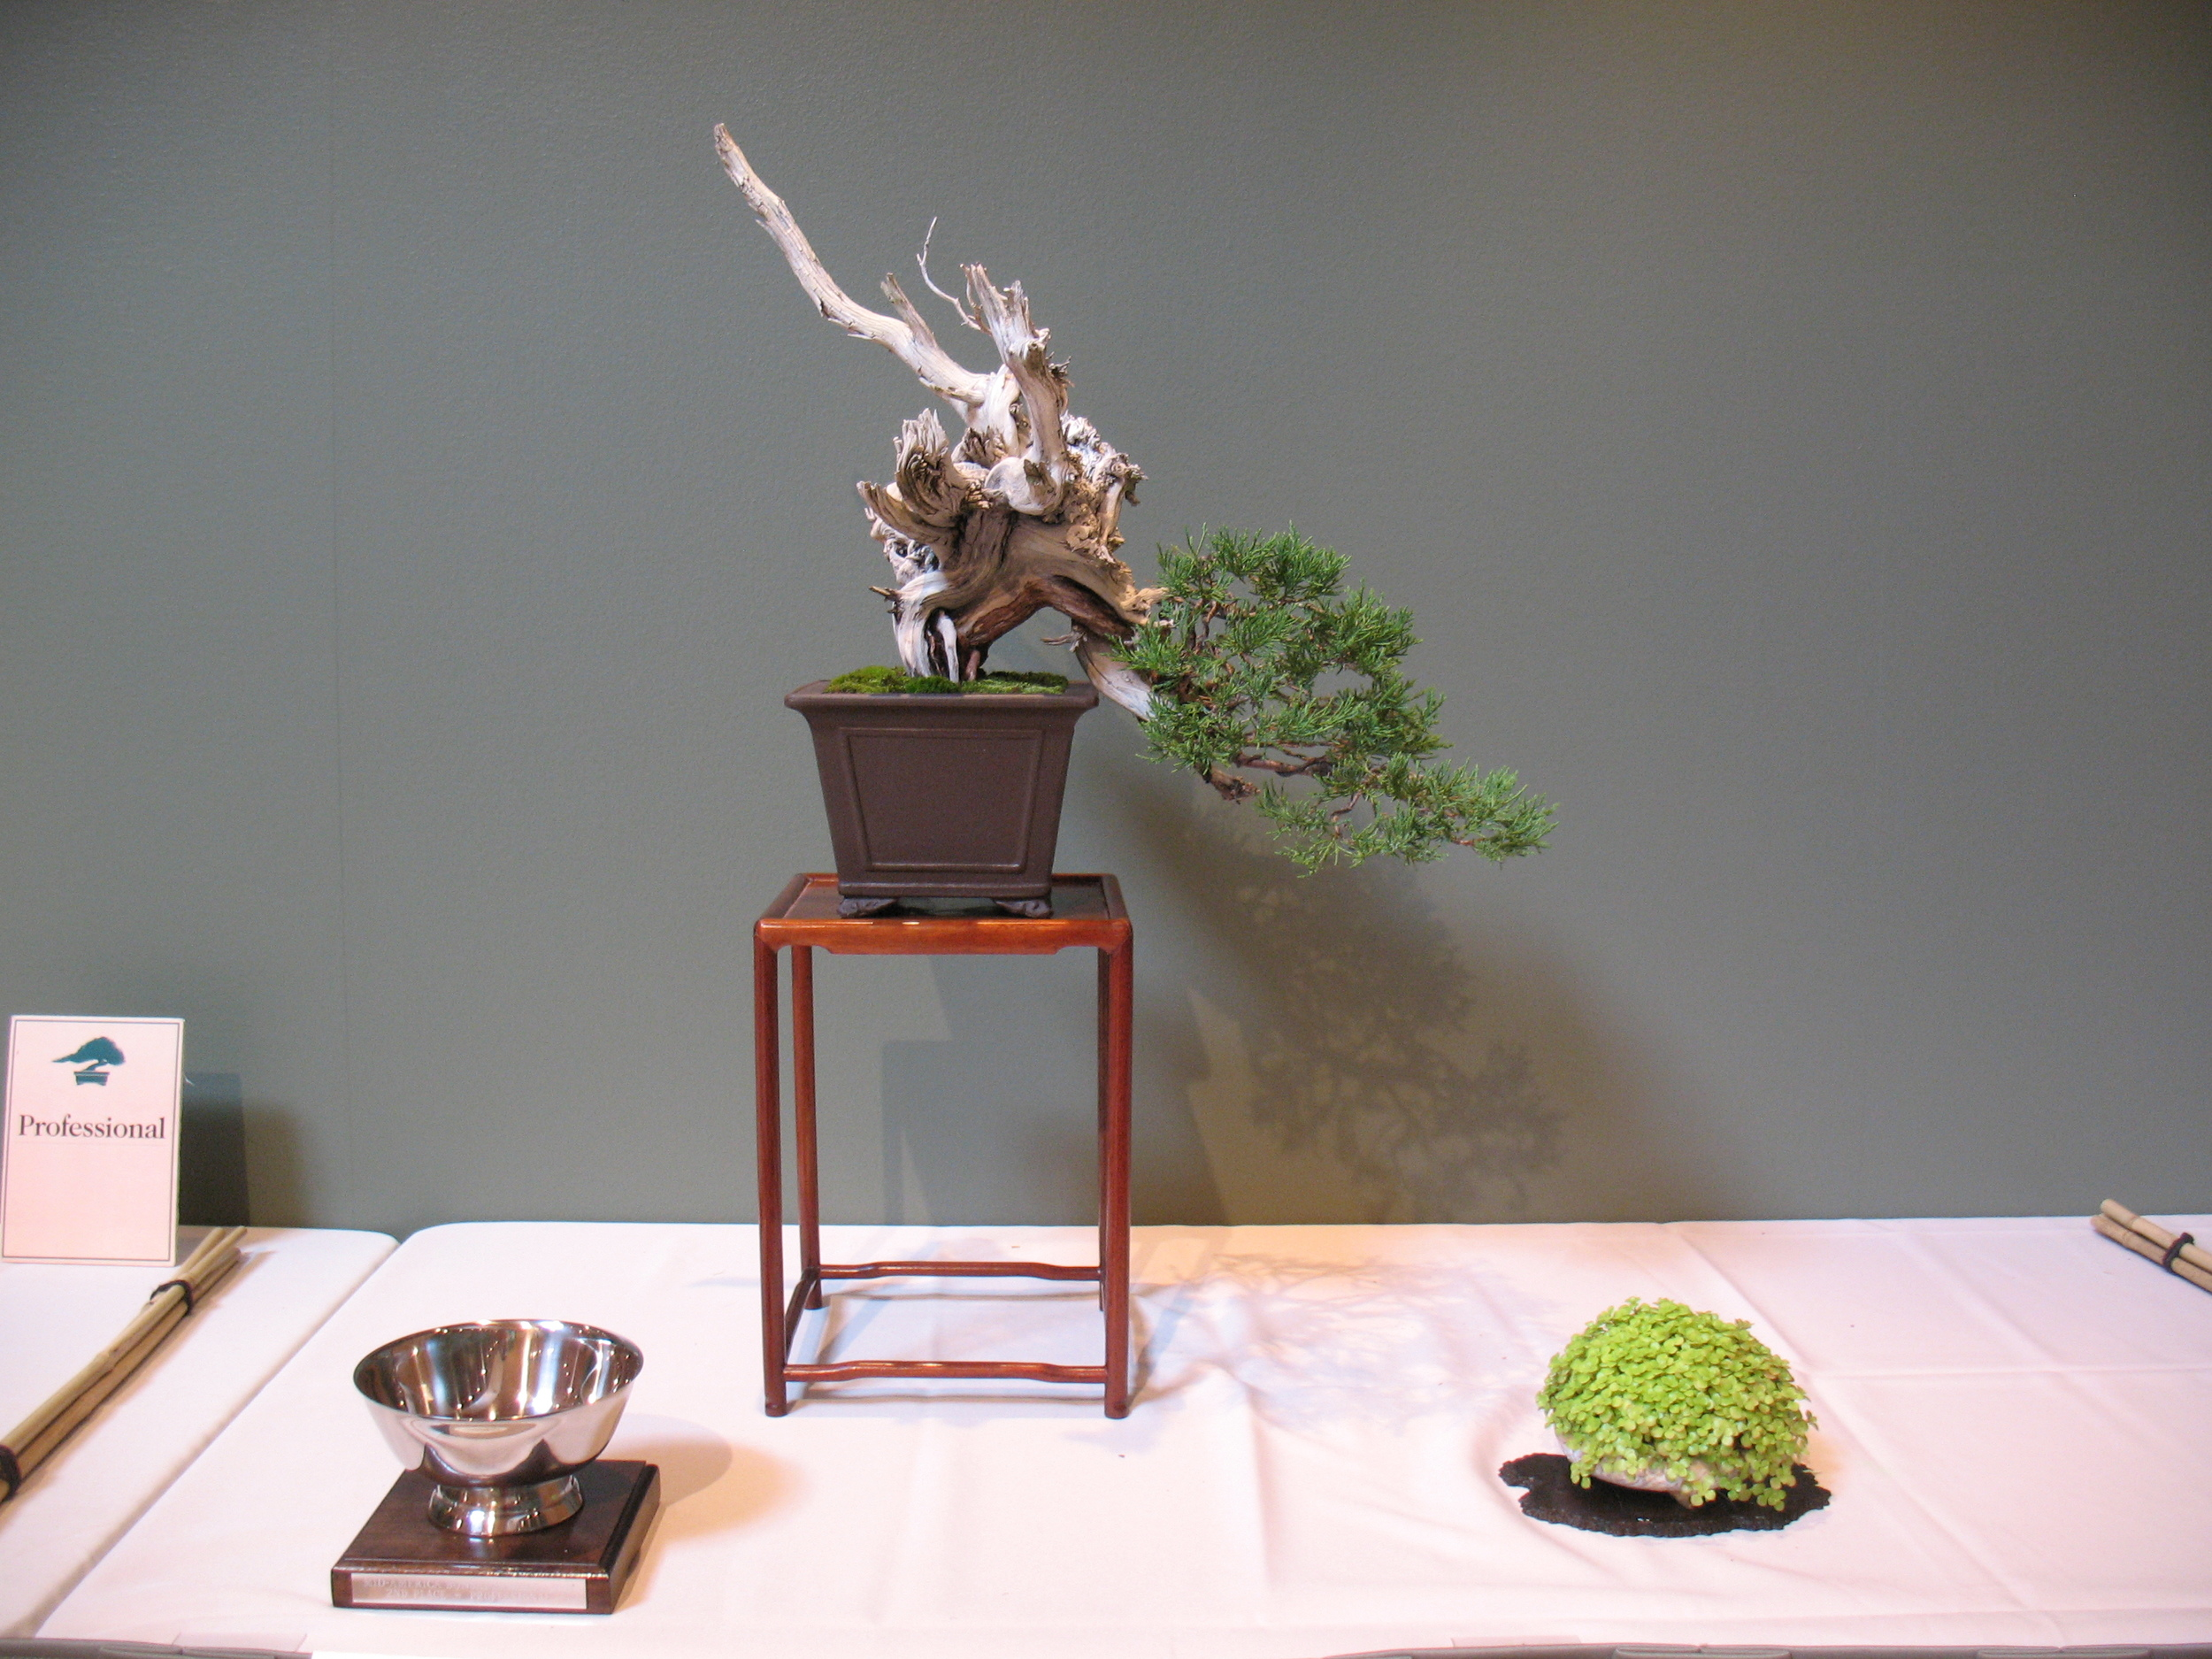 2015 Mid-America Exhibit - Professional - Rocky Mountain Juniper